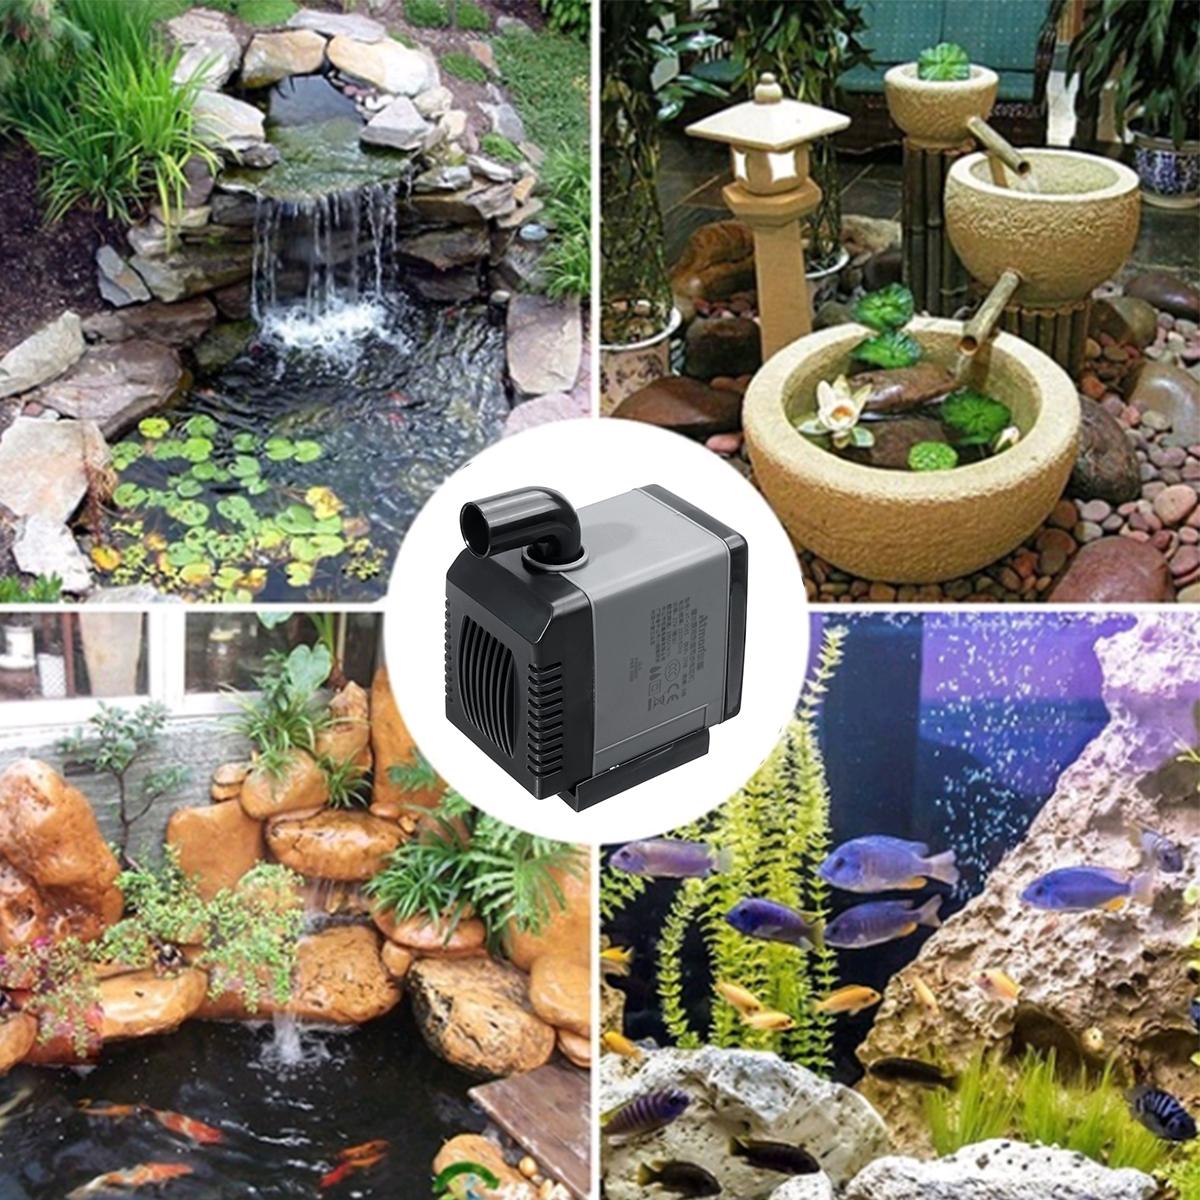 5-13W 220-240V Ultra-Quiet Submersible Water Pump Waterproof Fish Pond Aquarium Tank Fountain